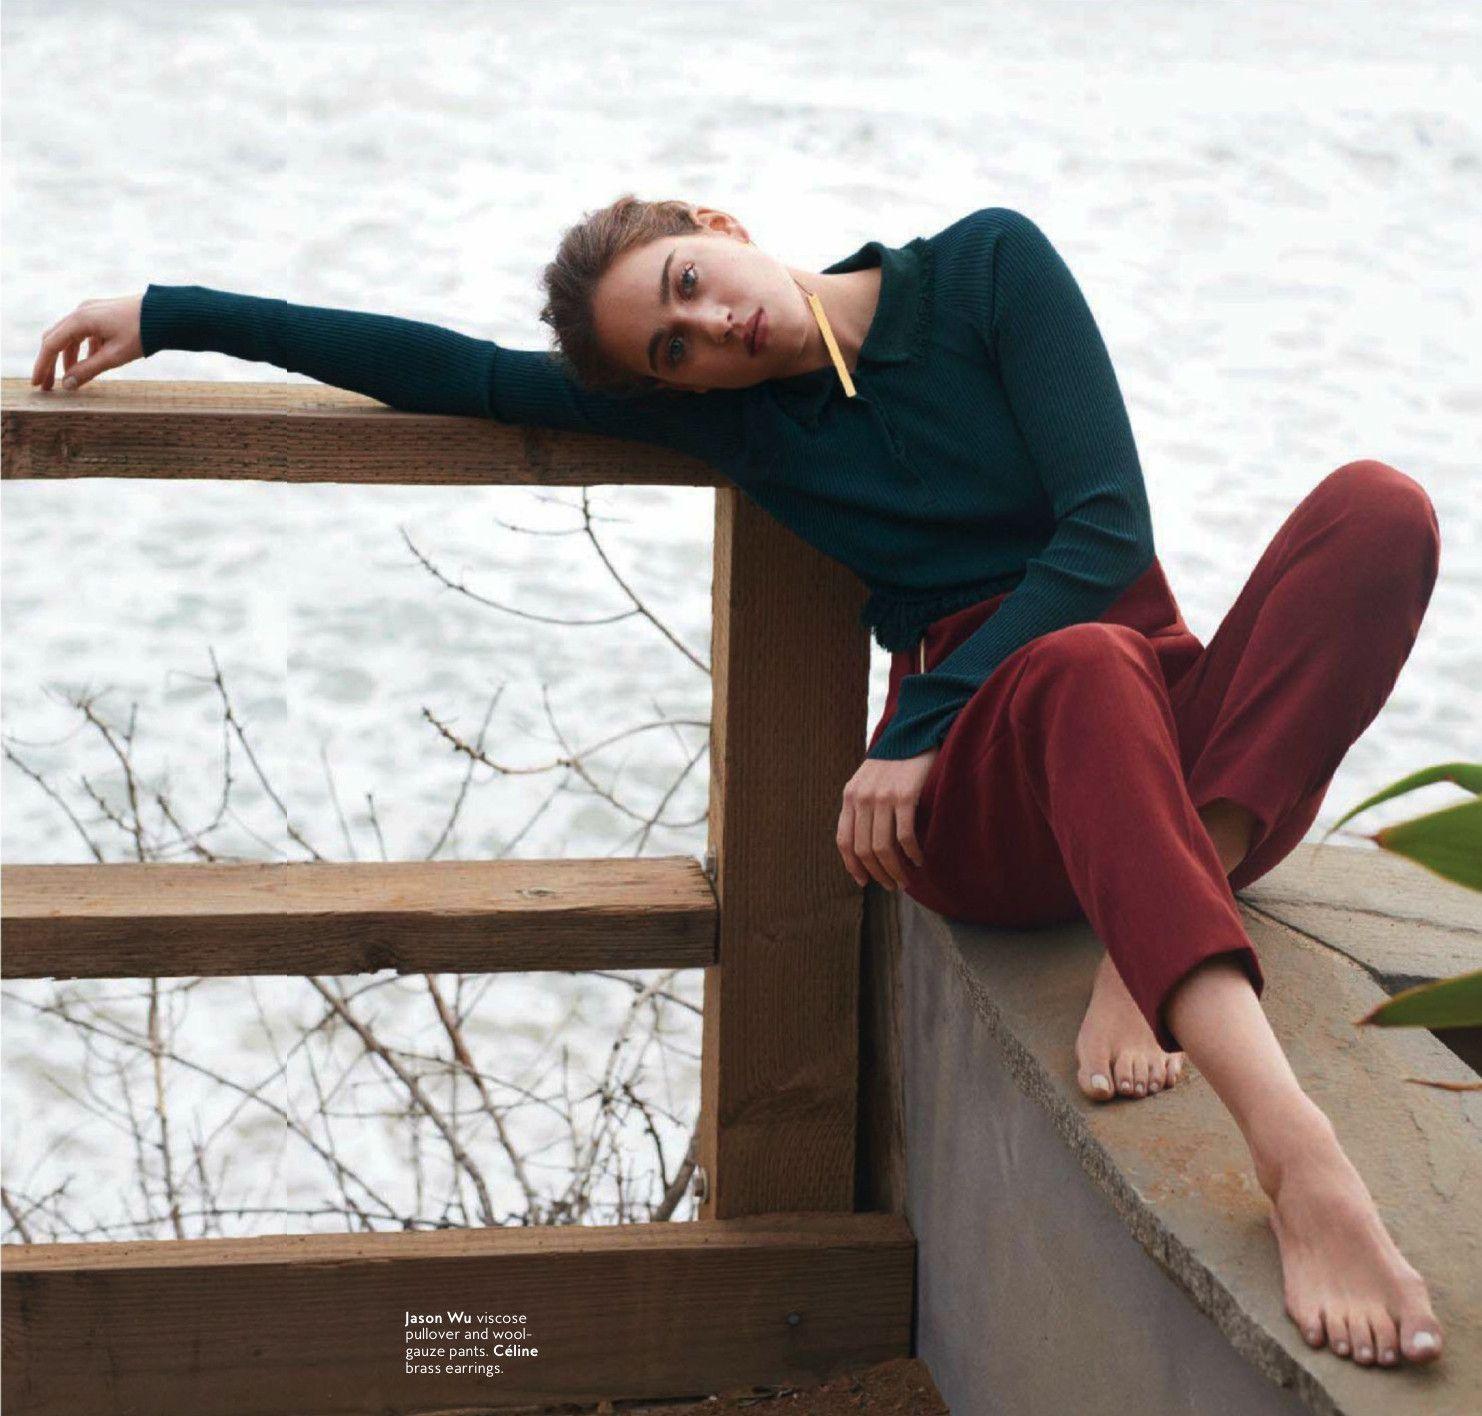 Melissa Lutz by David Alfons Wilhelm Bornscheuer for InStyle US - Jason Wu